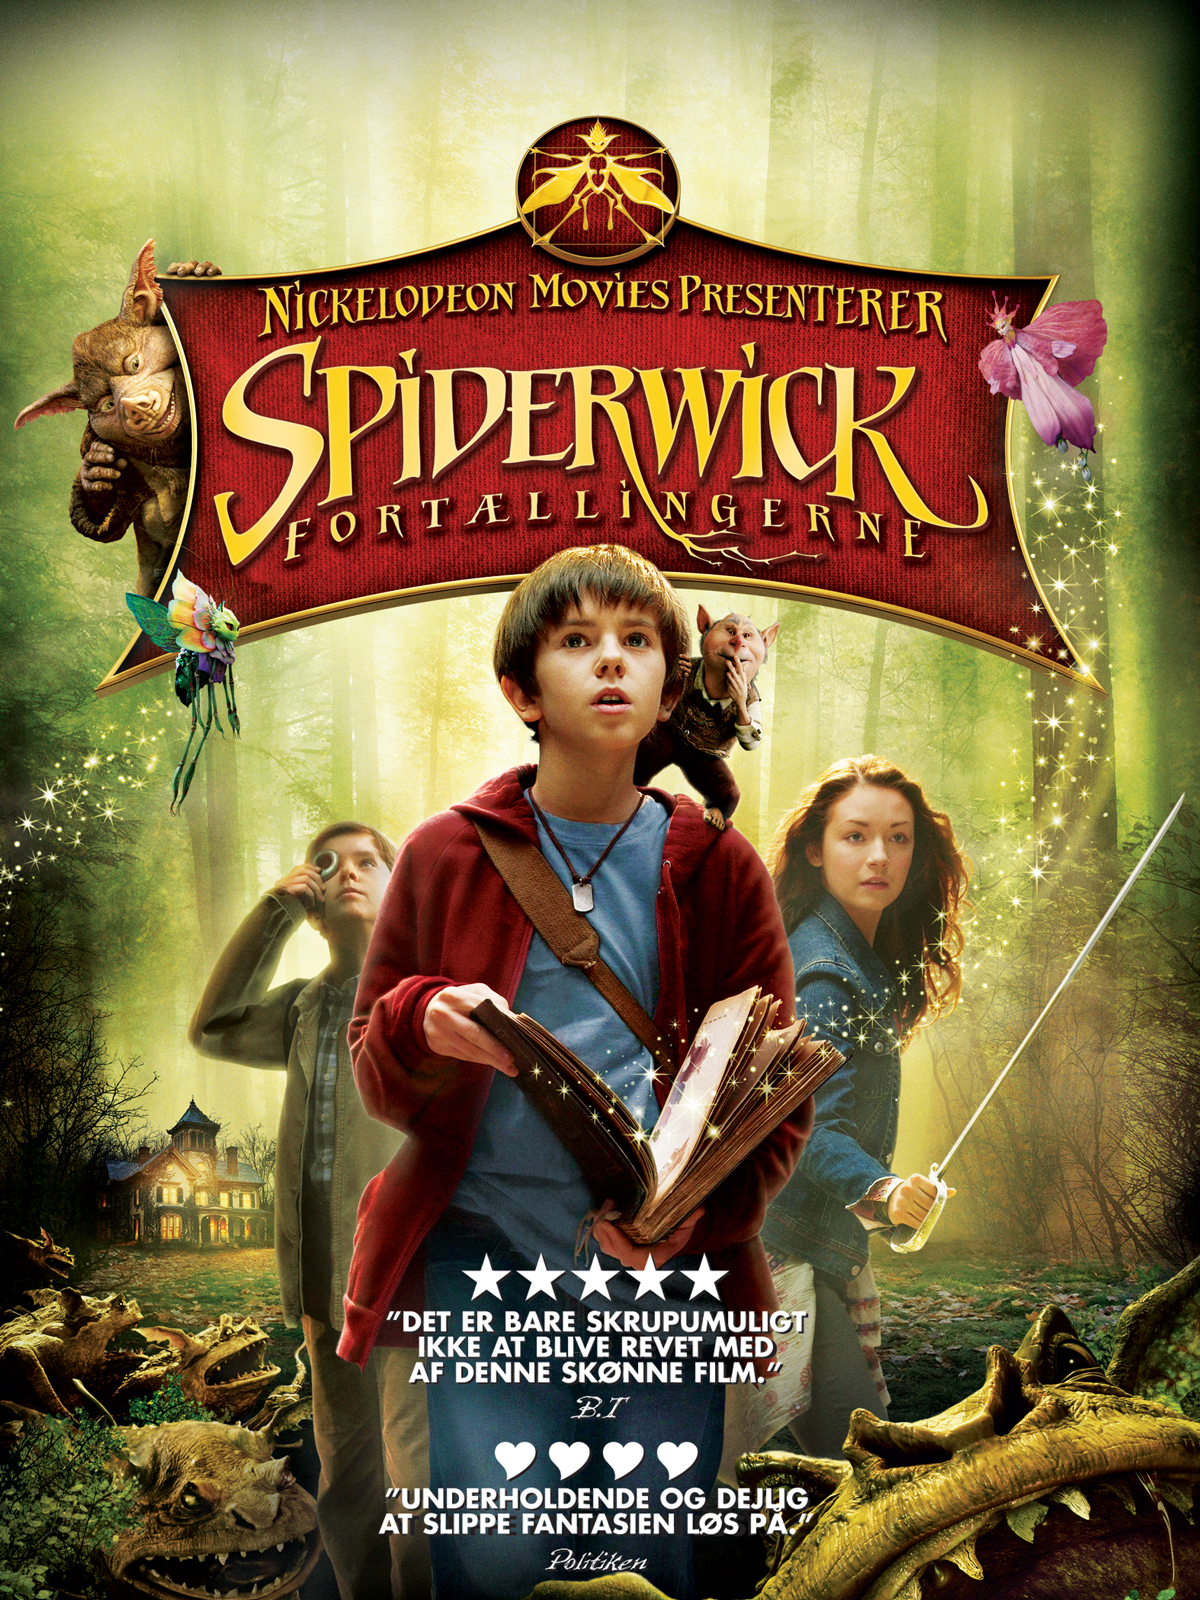 Spiderwick Fortallingerne